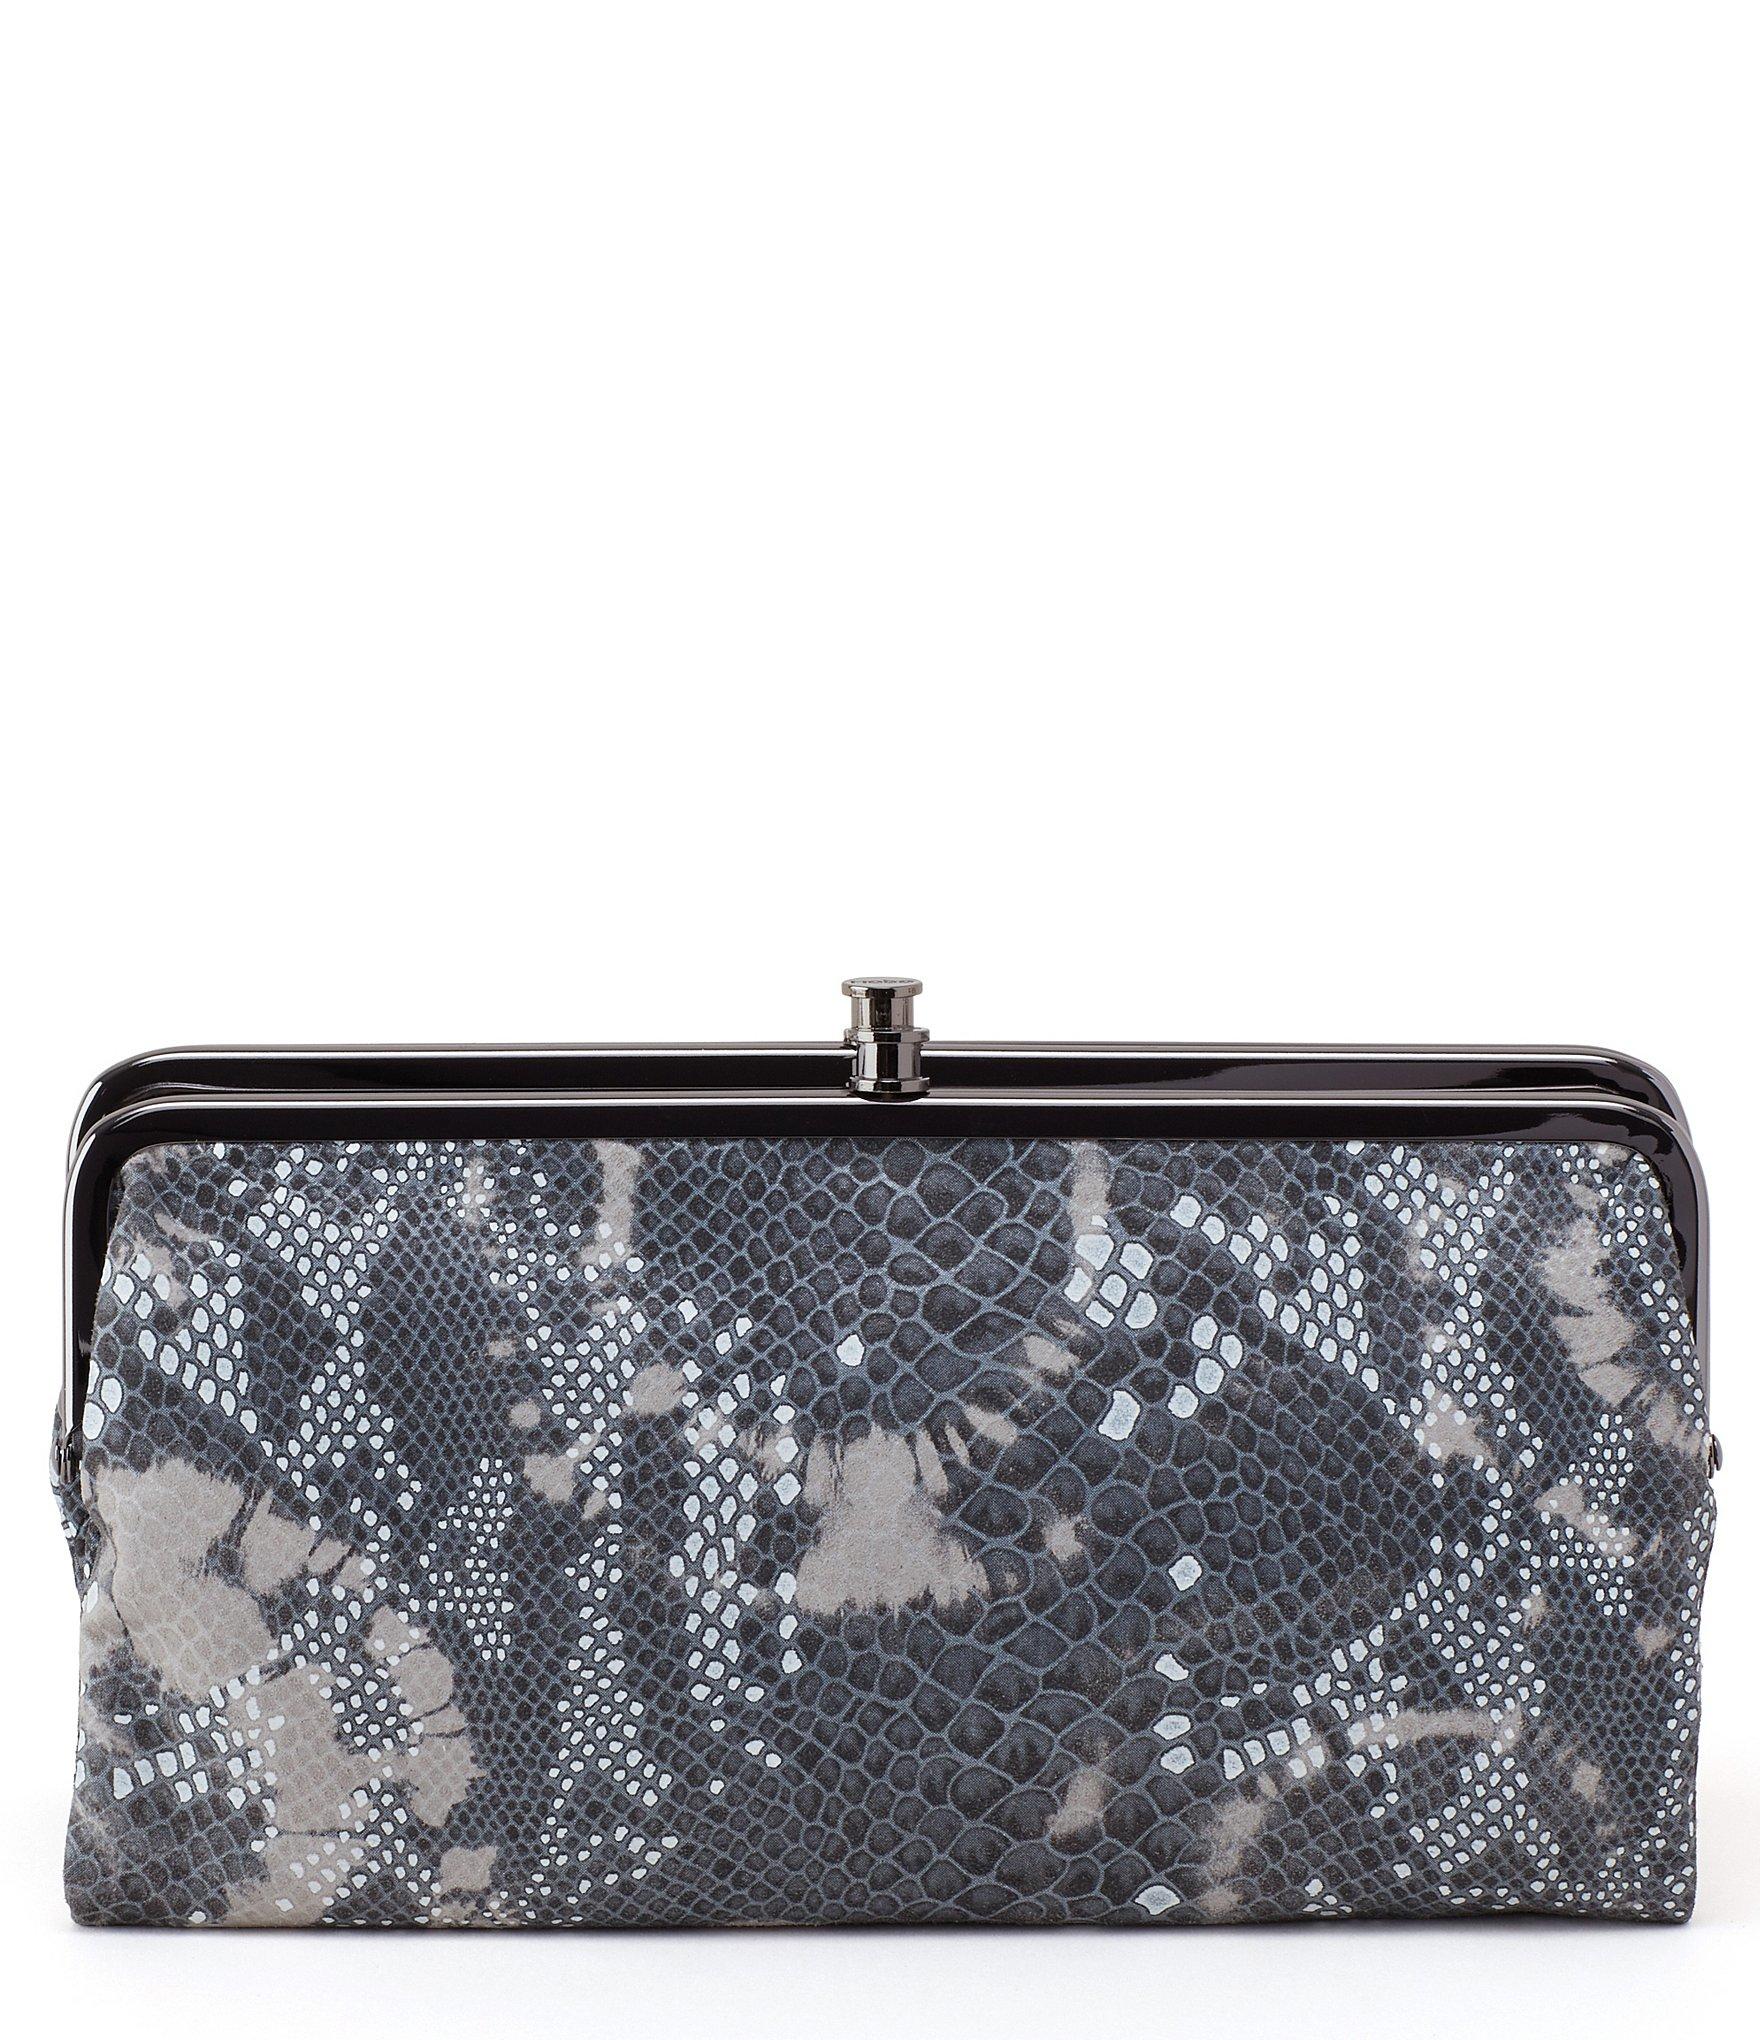 hobo multicolor original lauren snake patterned double frame clutch wallet lyst - Double Frame Clutch Wallet